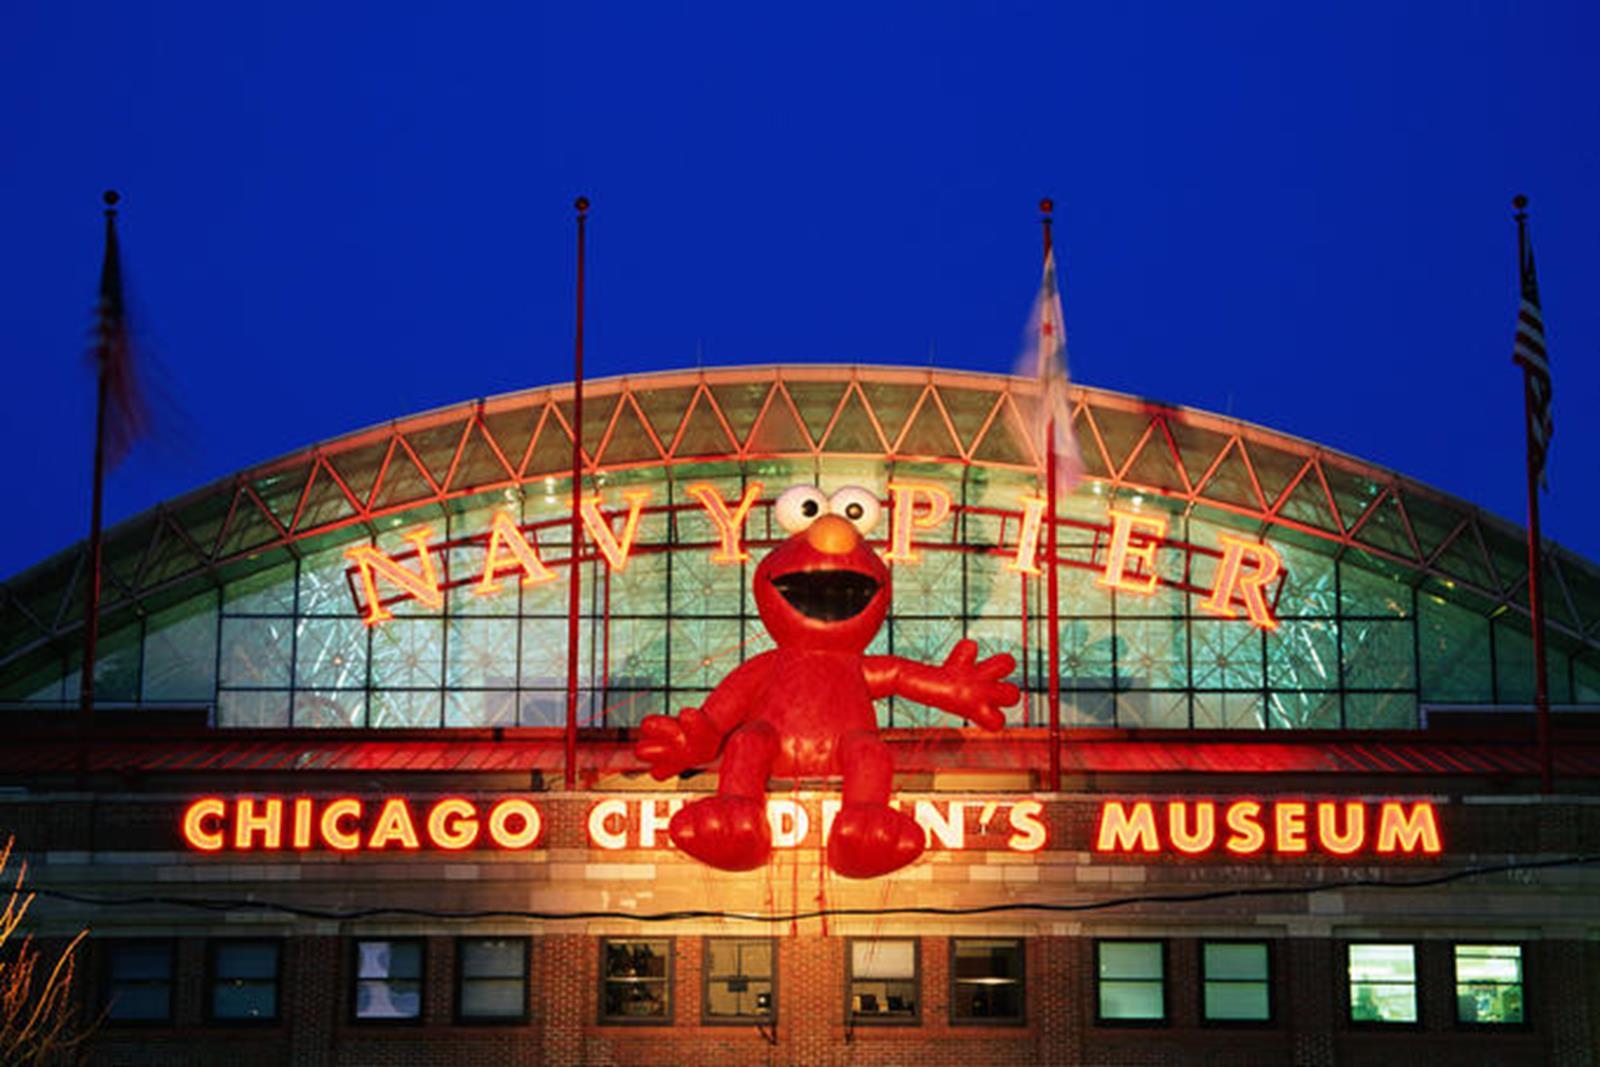 Chicago Children's Museum. Credit